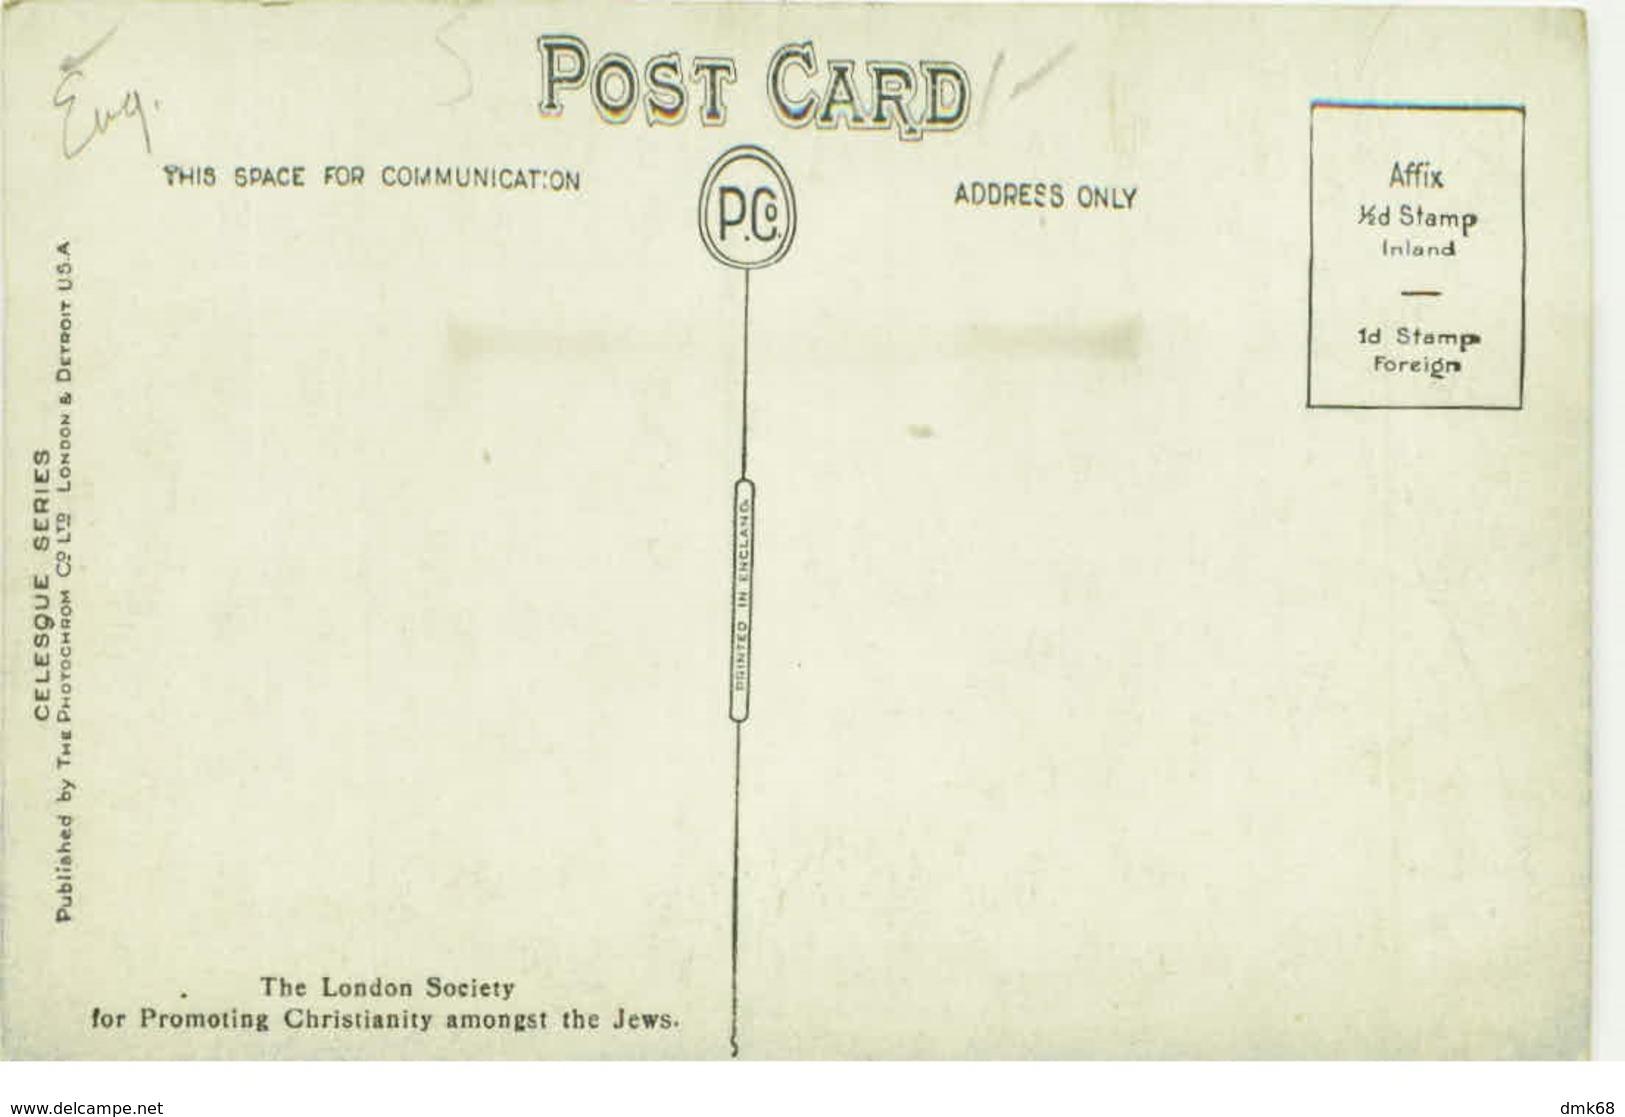 ISRAEL / LEBANON / SYRIA - MOUNT HERMON -  CELESQUE SERIE - 1920s (BG808) - Cartes Postales